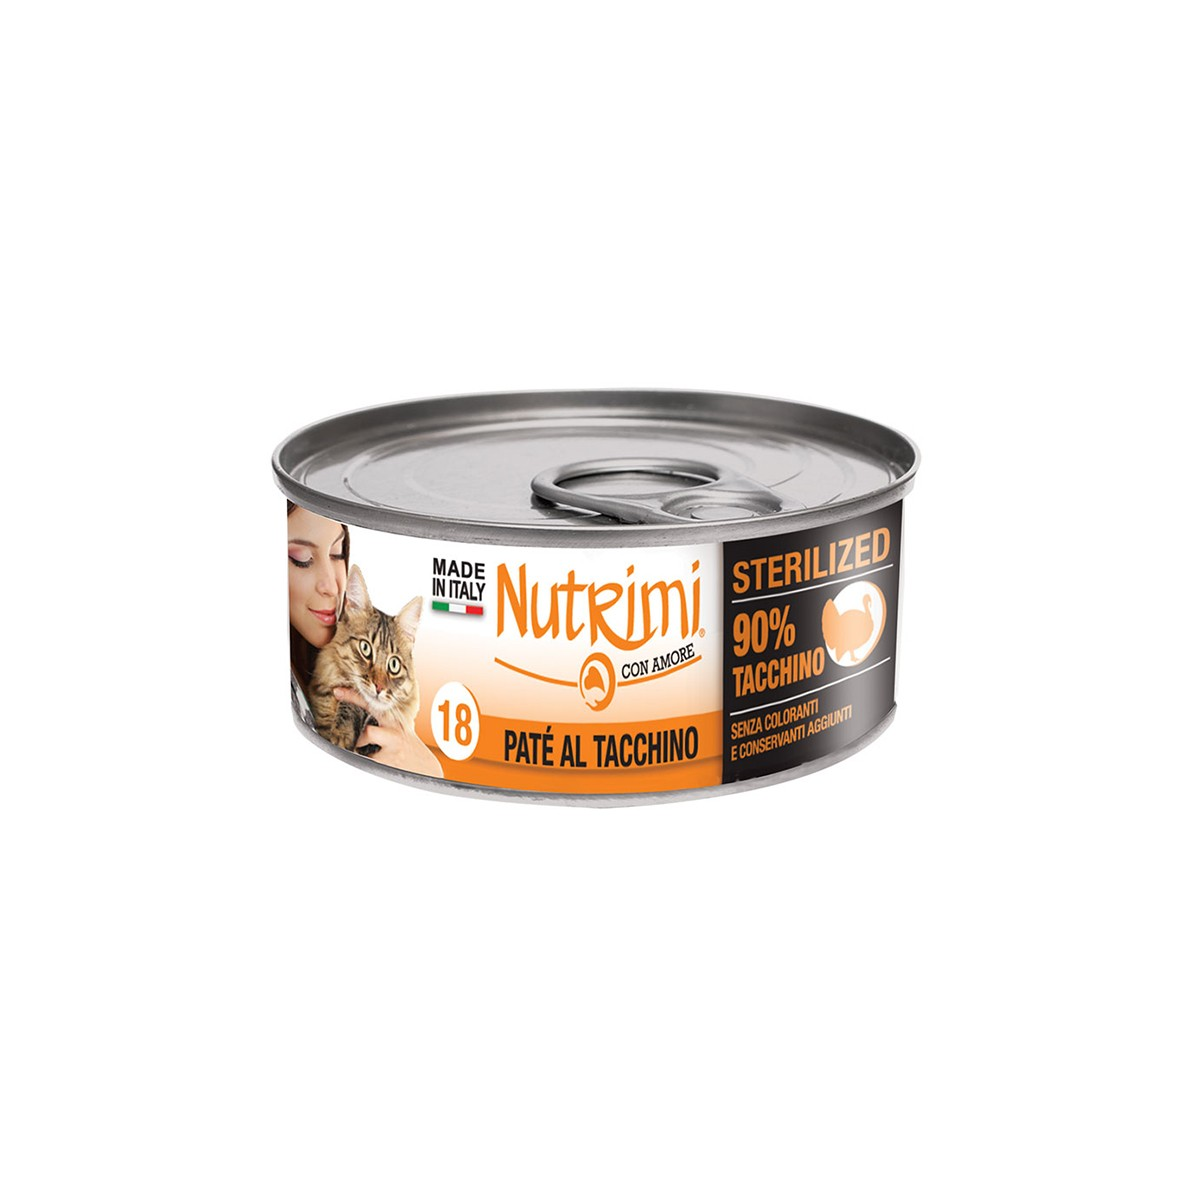 Nutrimi Pate' Sterilized Tacchino